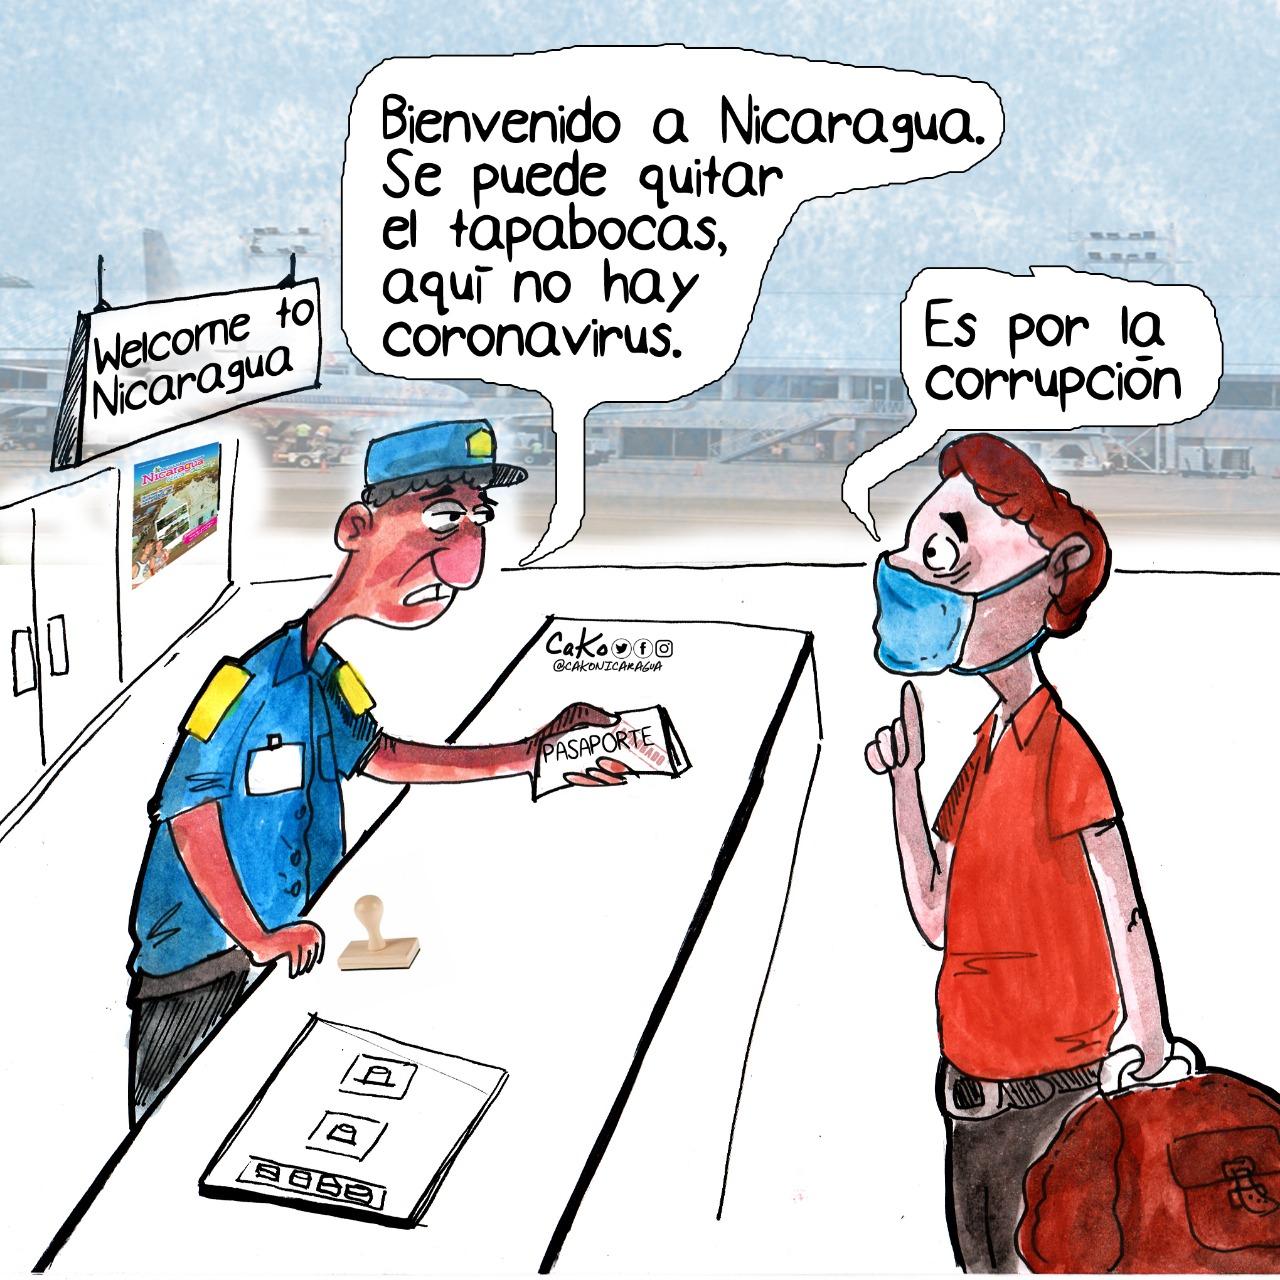 La Caricatura: El virus que destruye a Nicaragua